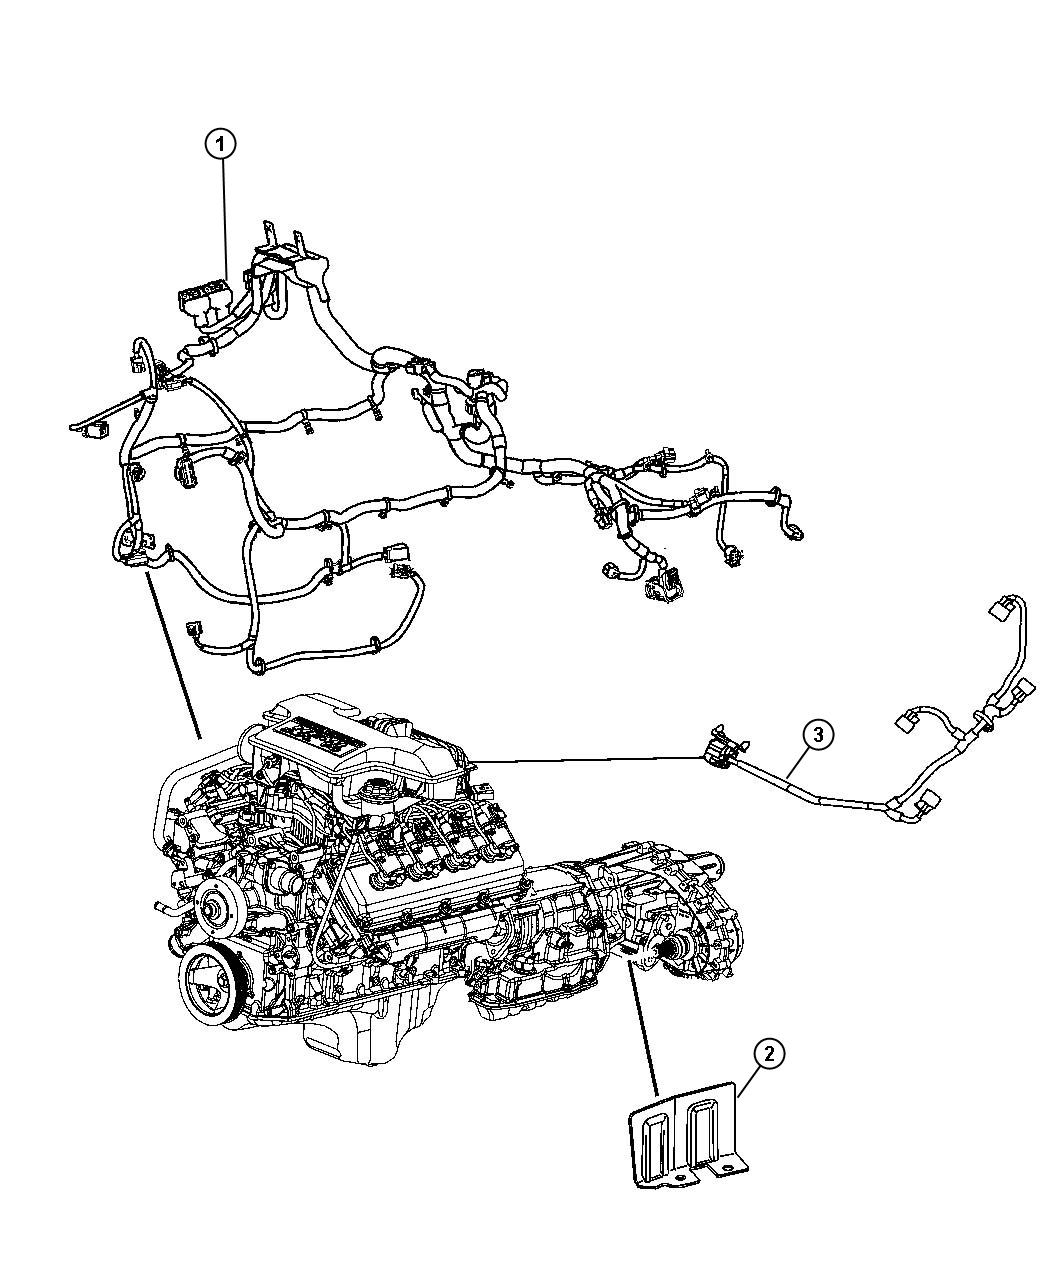 2005 Chrysler 300 Wiring. Jumper. Multiple displacement